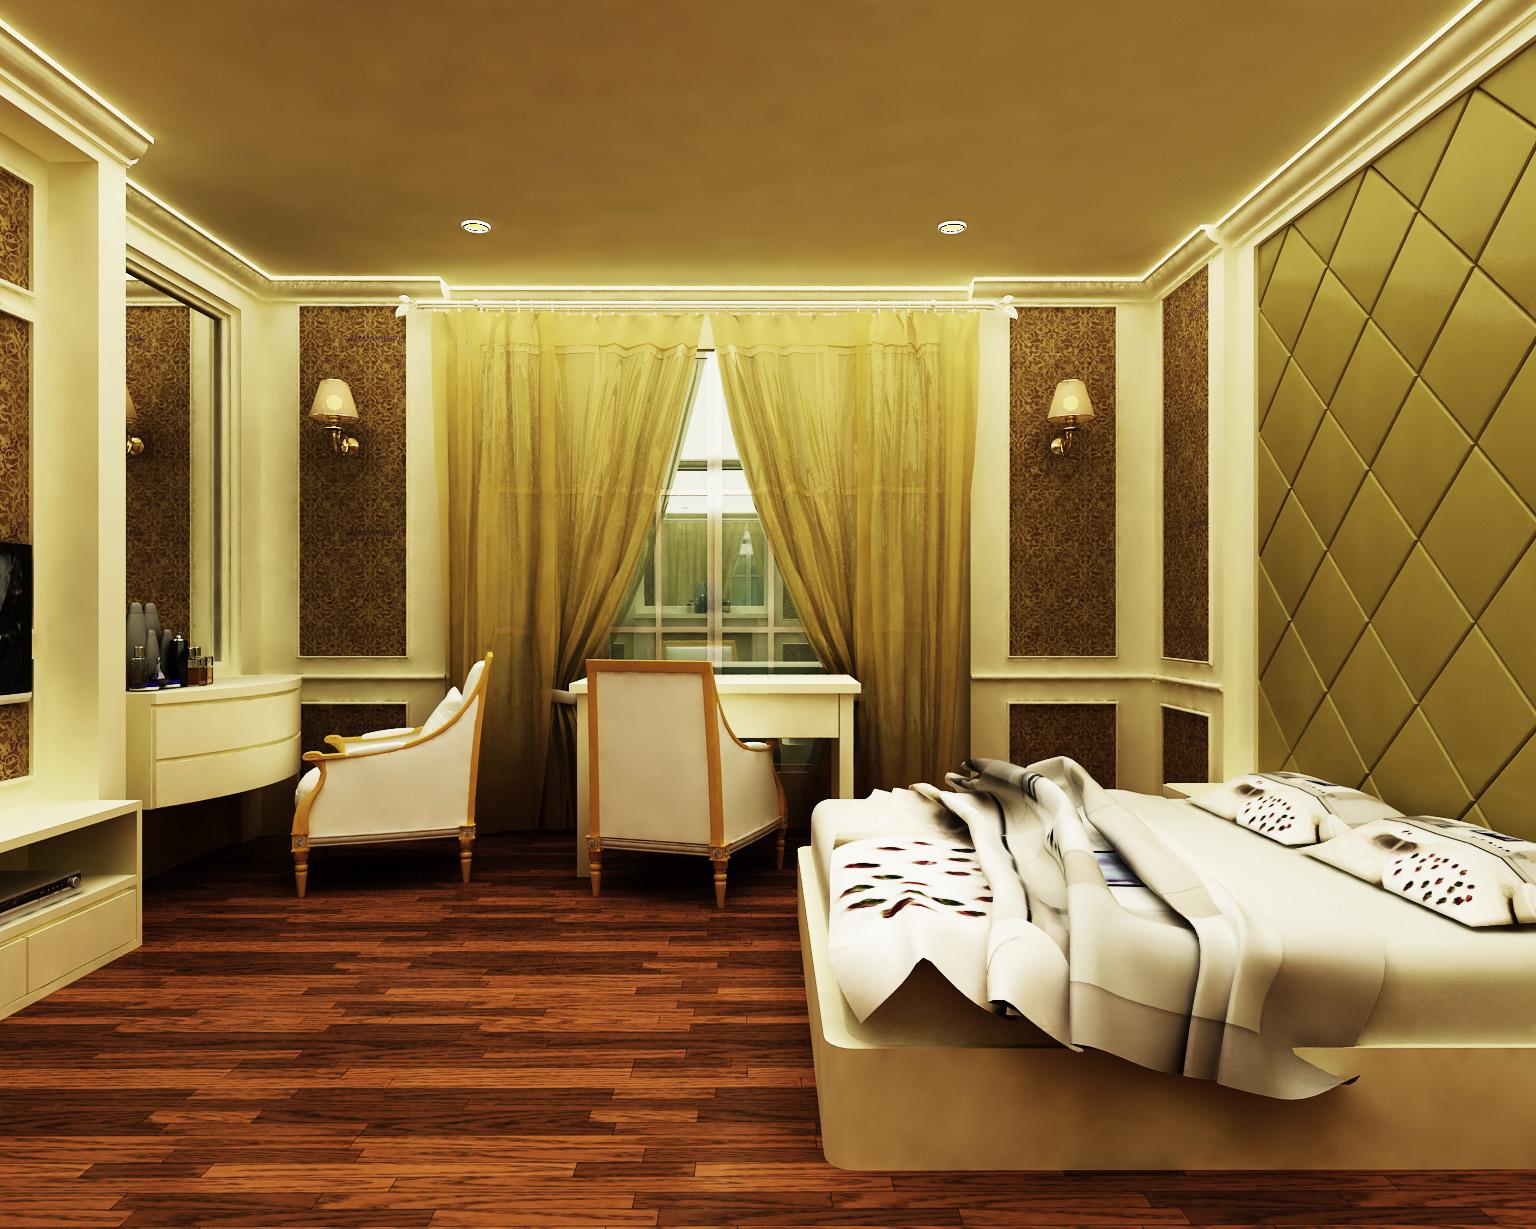 classic bedroom design by forevalonejackk classic bedroom design by forevalonejackk